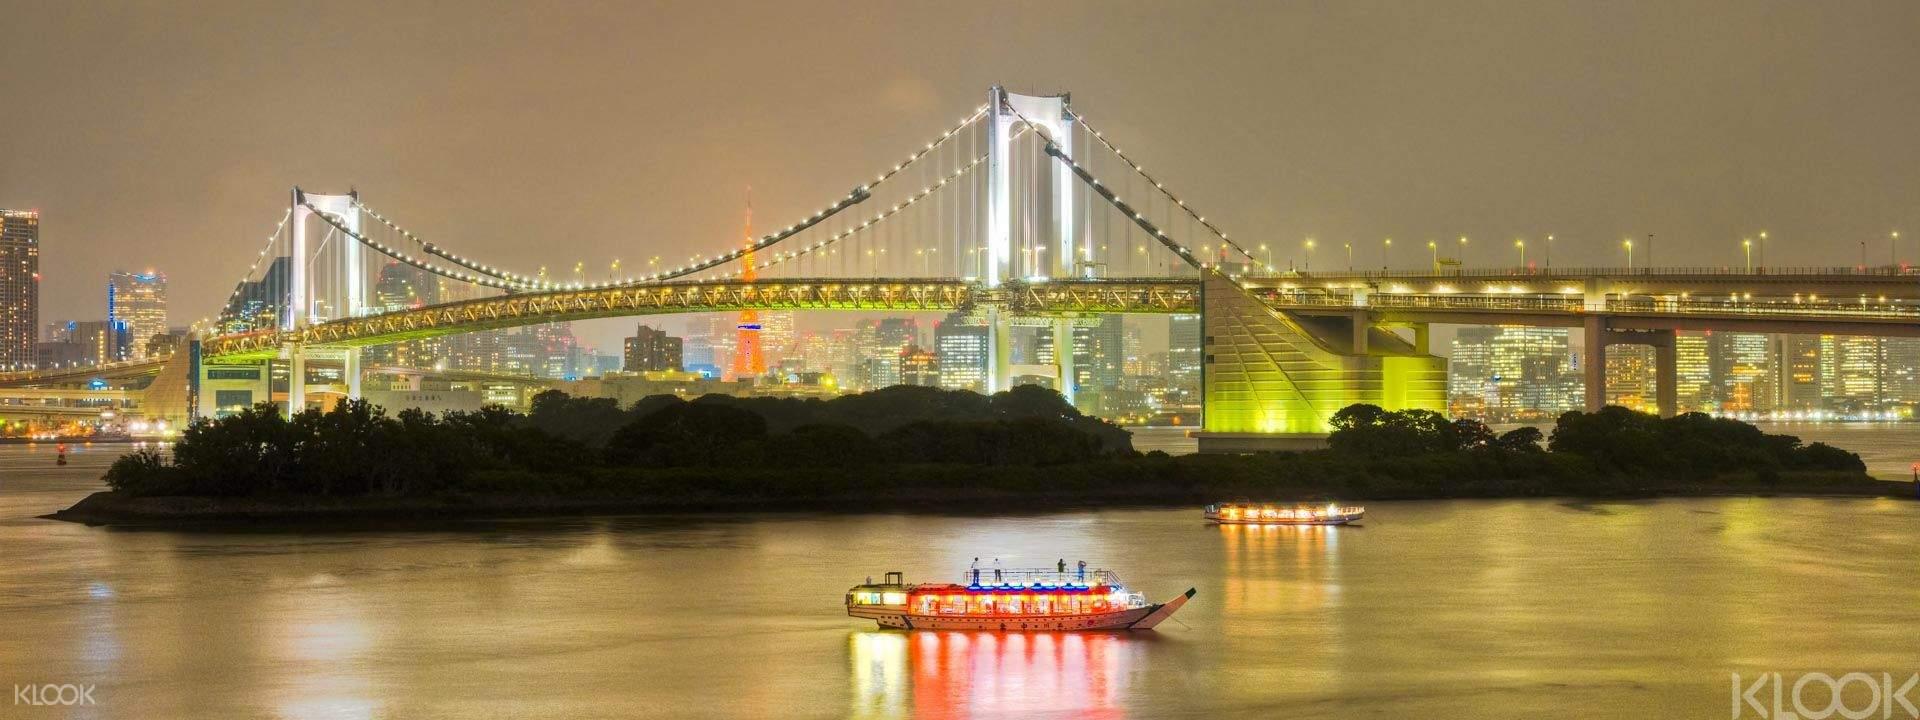 Tokyo Dinner Cruise